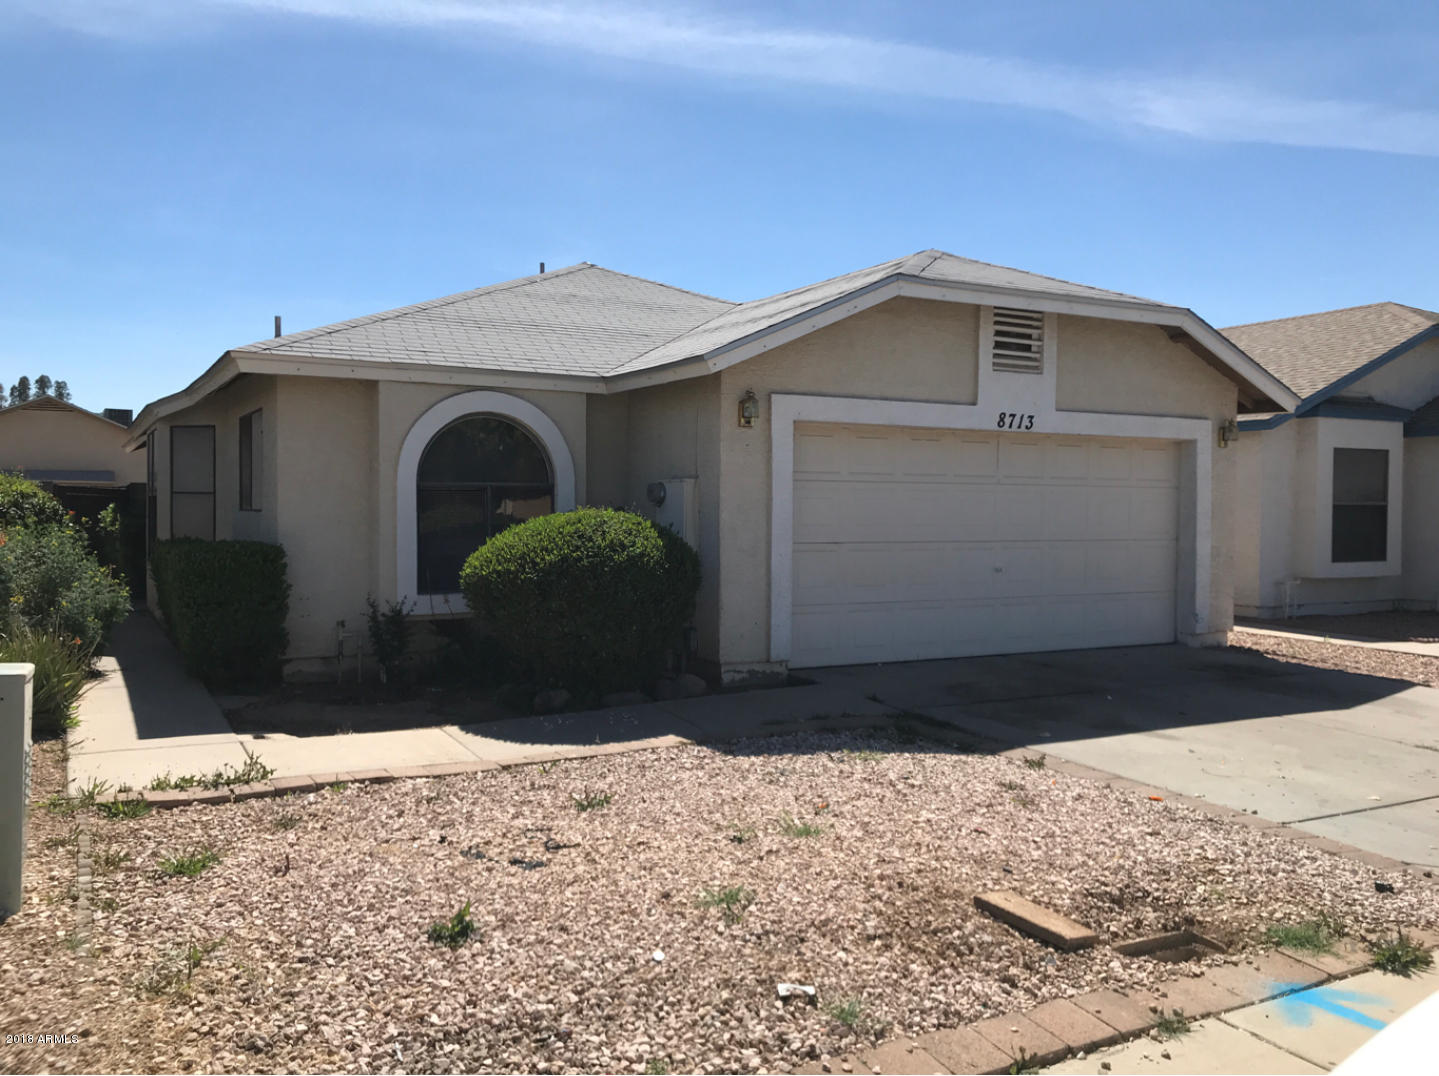 Photo for 8713 W Indianola Avenue, Phoenix, AZ 85037 (MLS # 5950290)